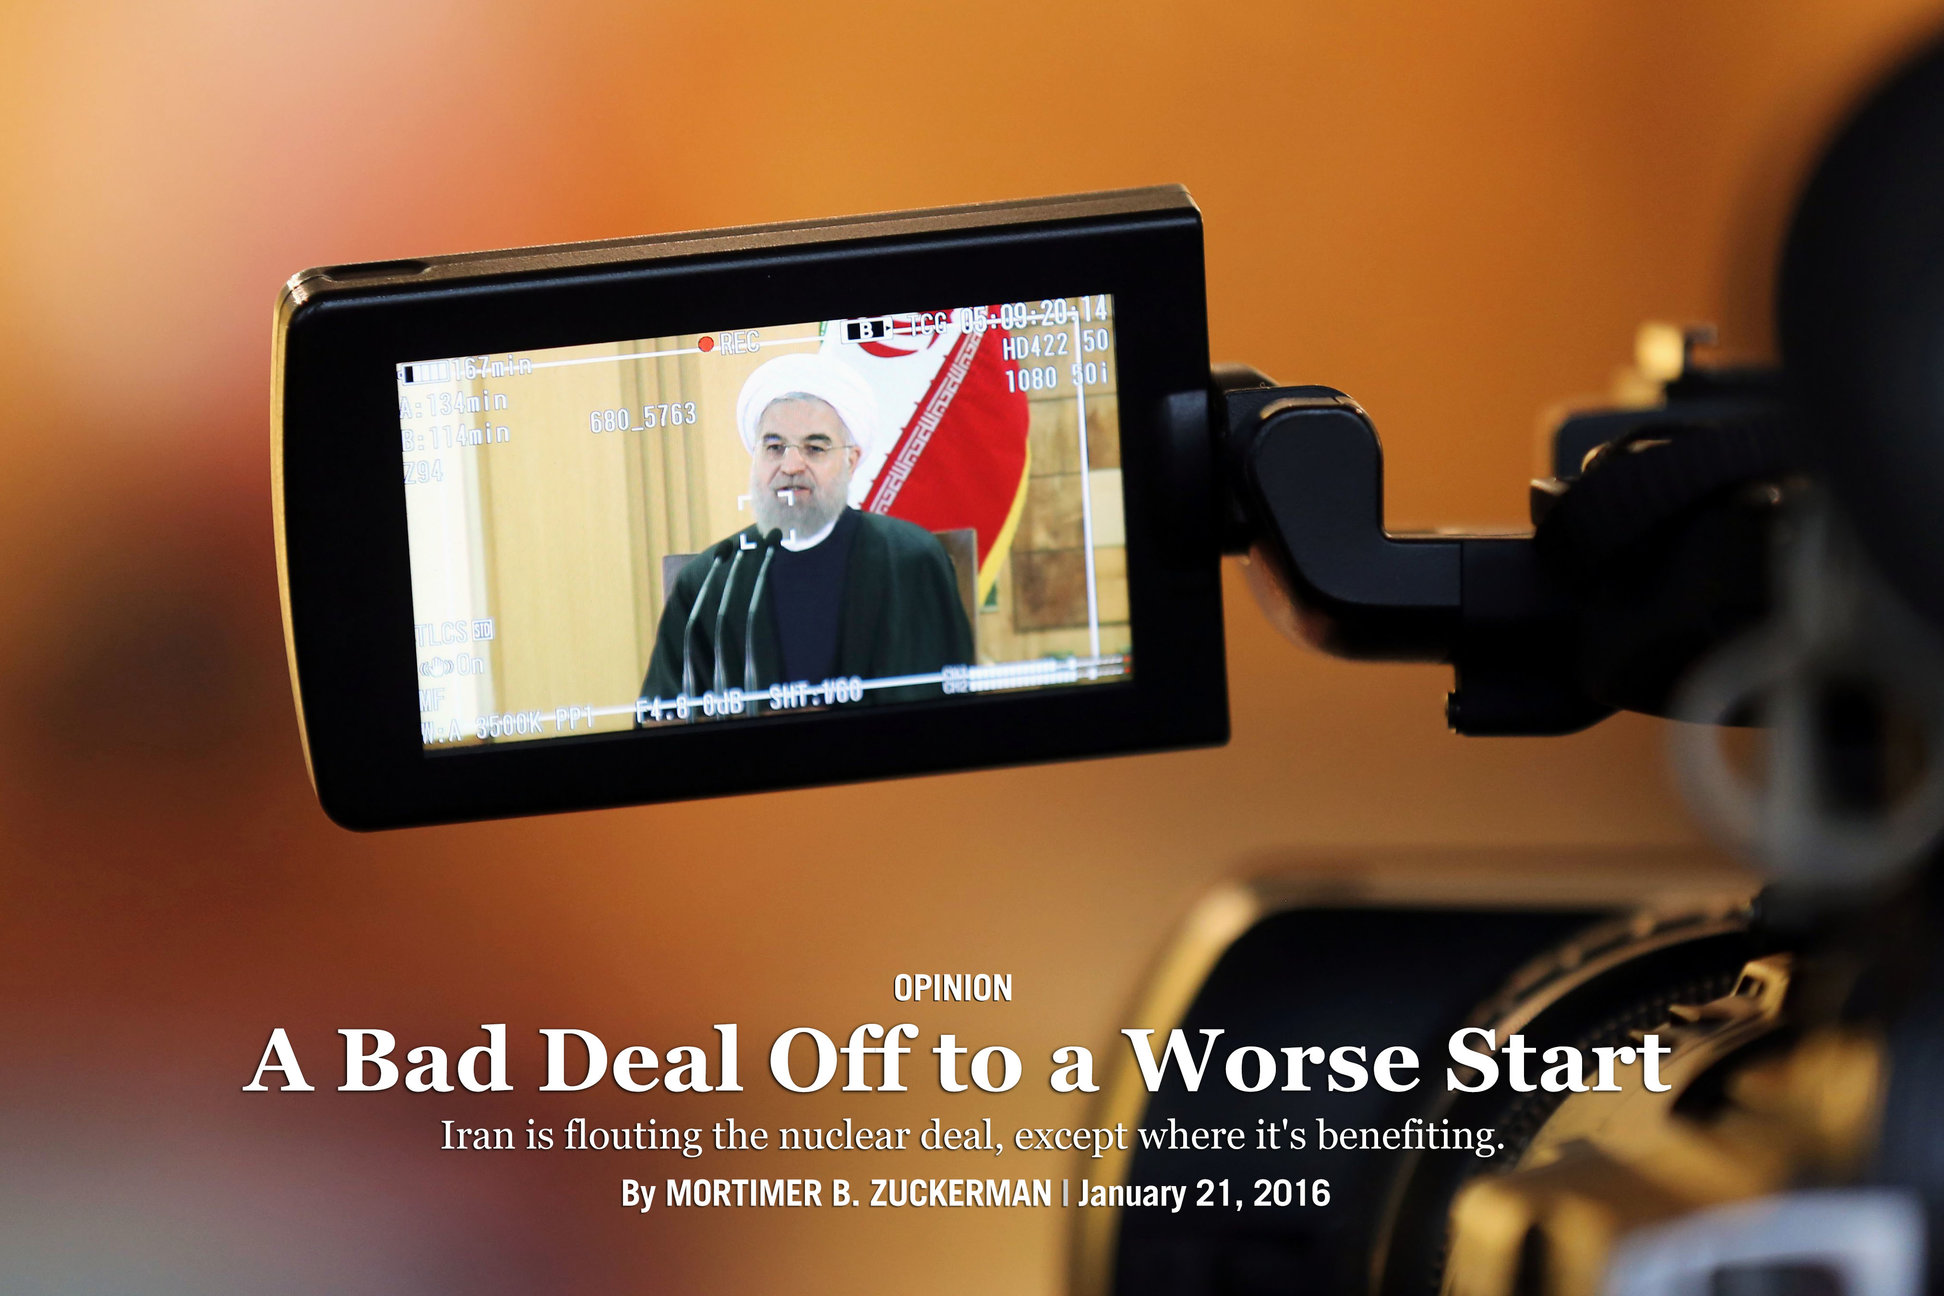 www.usnews.com.jpg